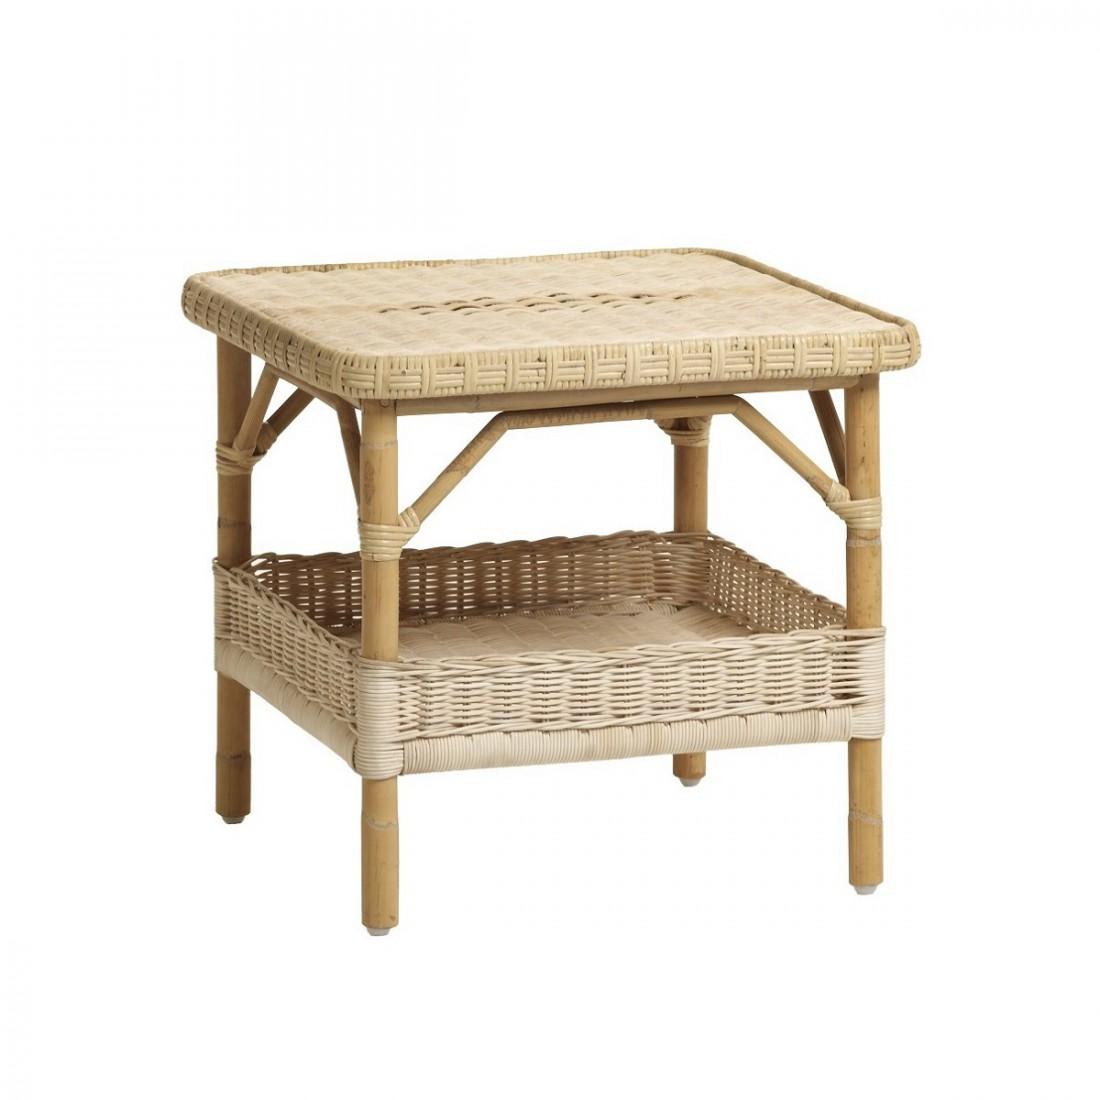 Table bois nantuket for Table en rotin blanc